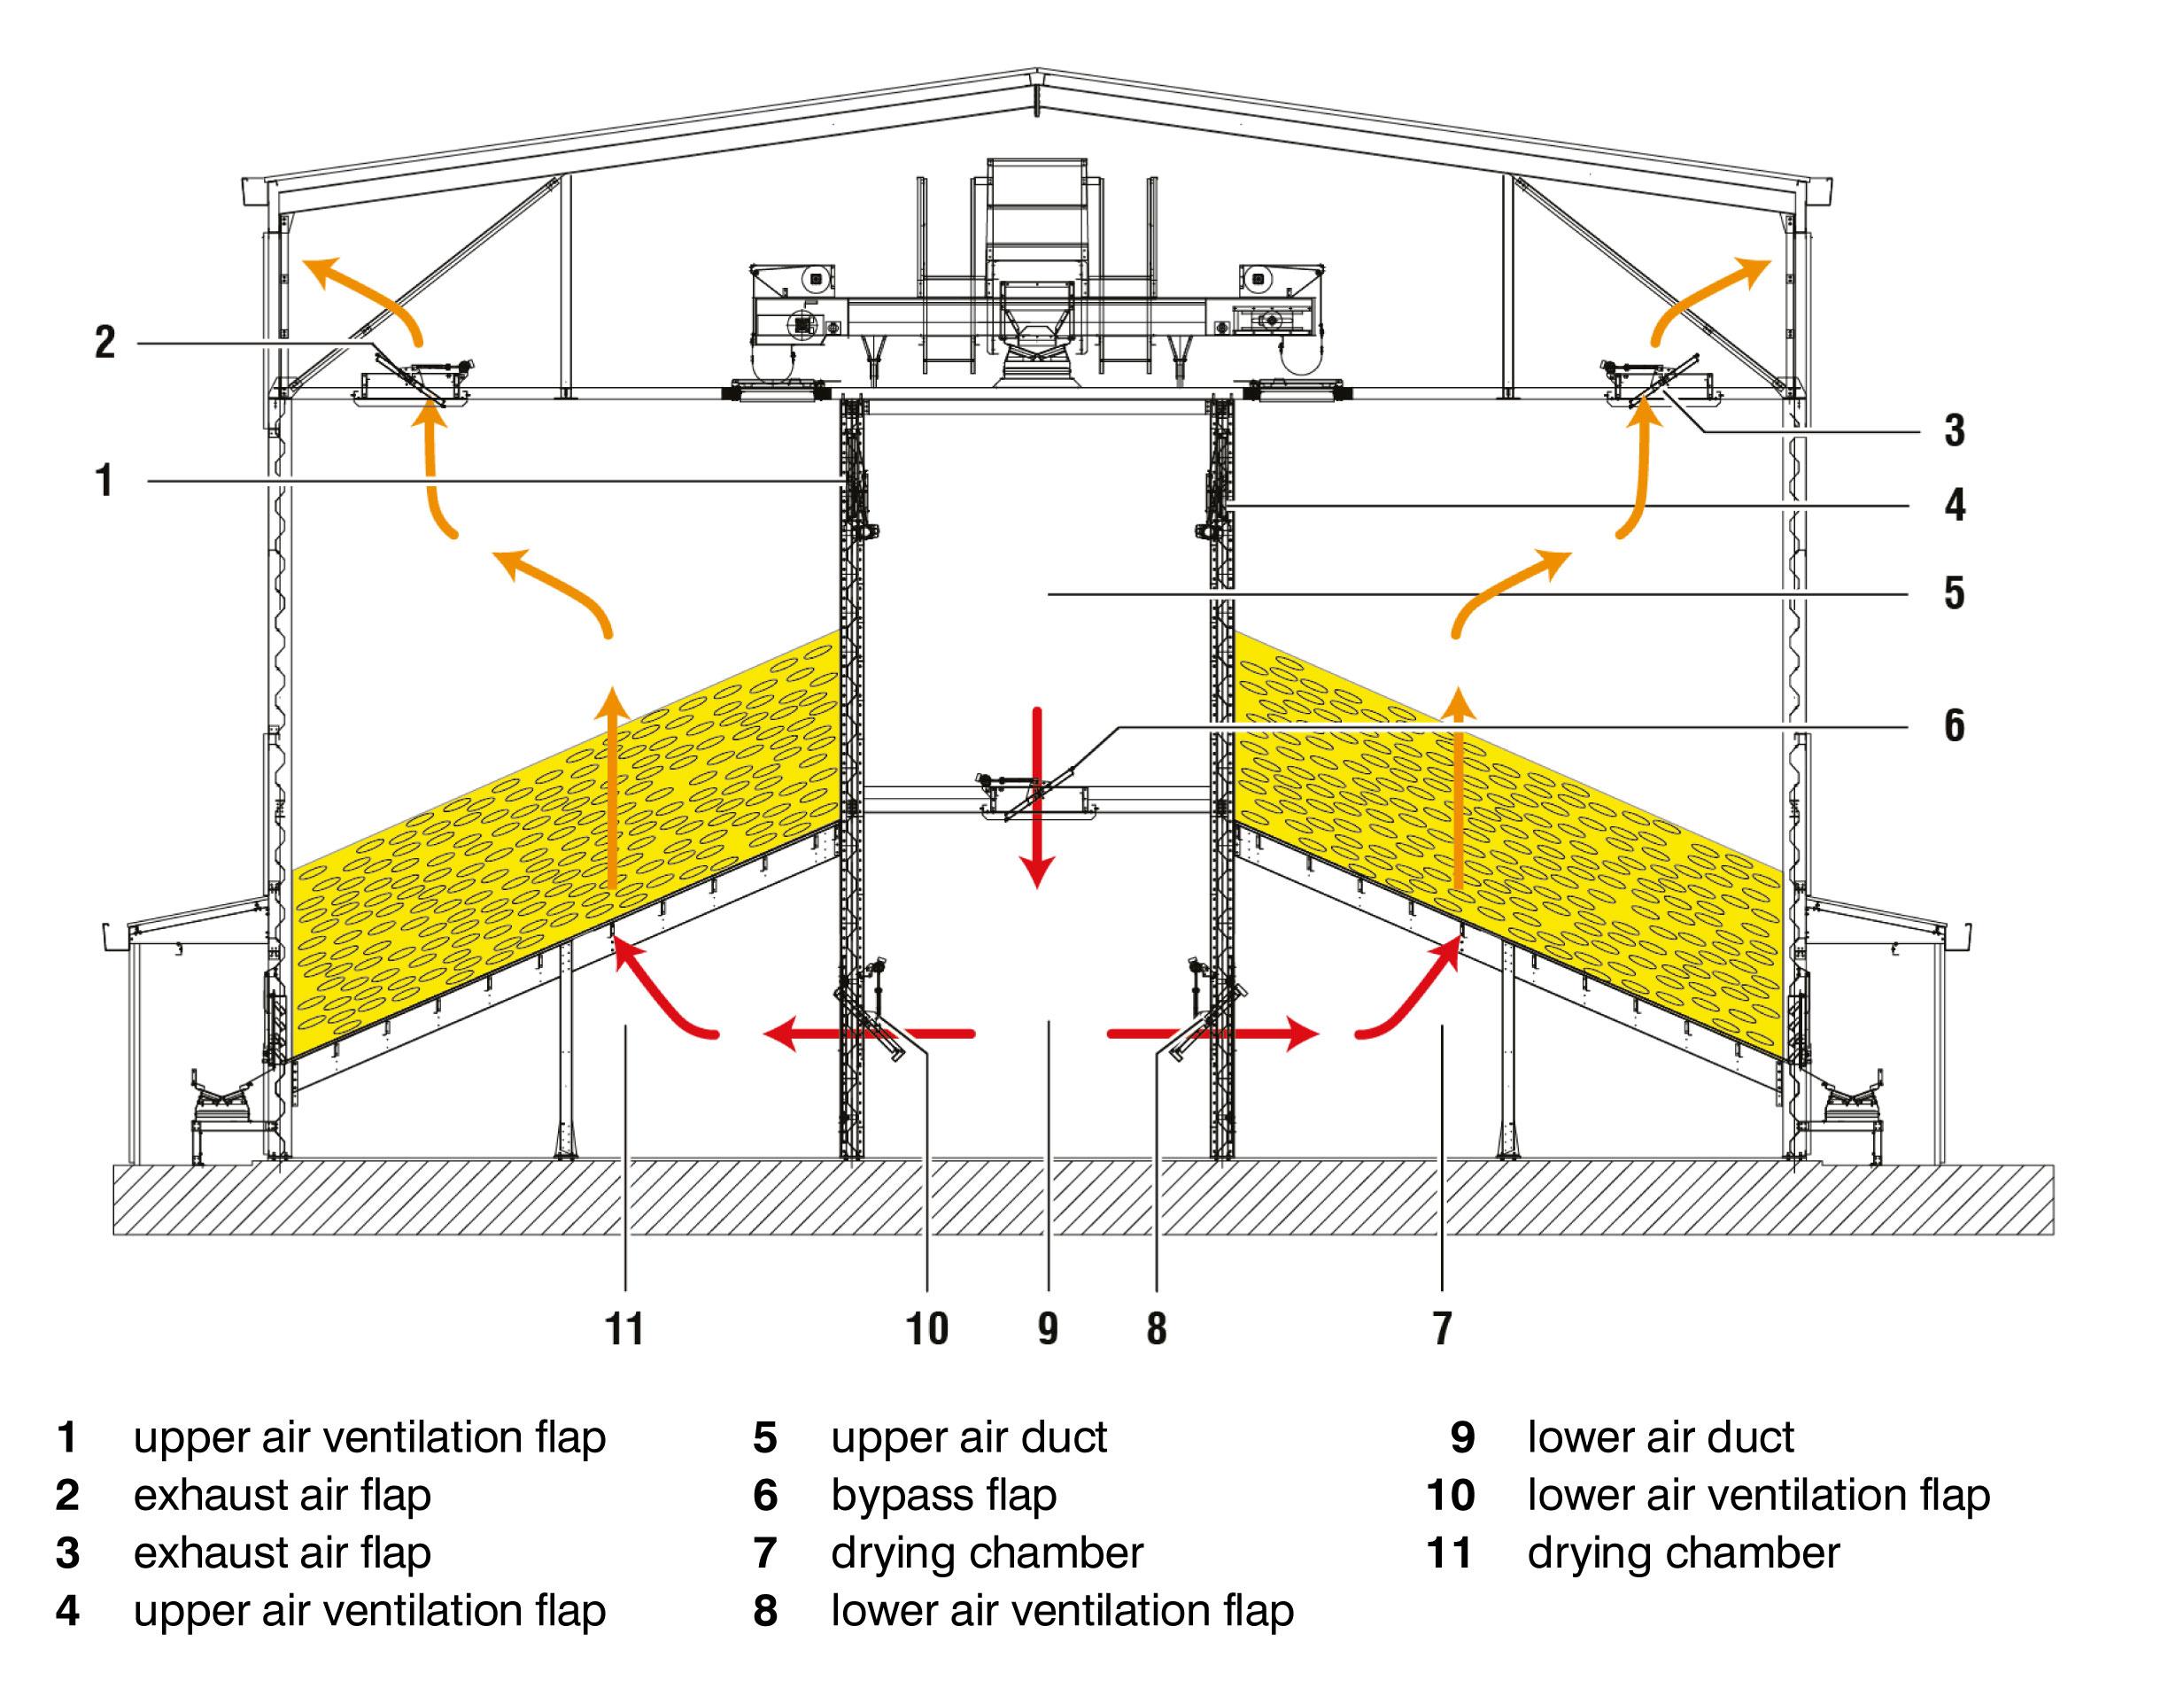 Petkus technologie gmbh saatgut technologien und getreide lagersysteme characteristics ccuart Images